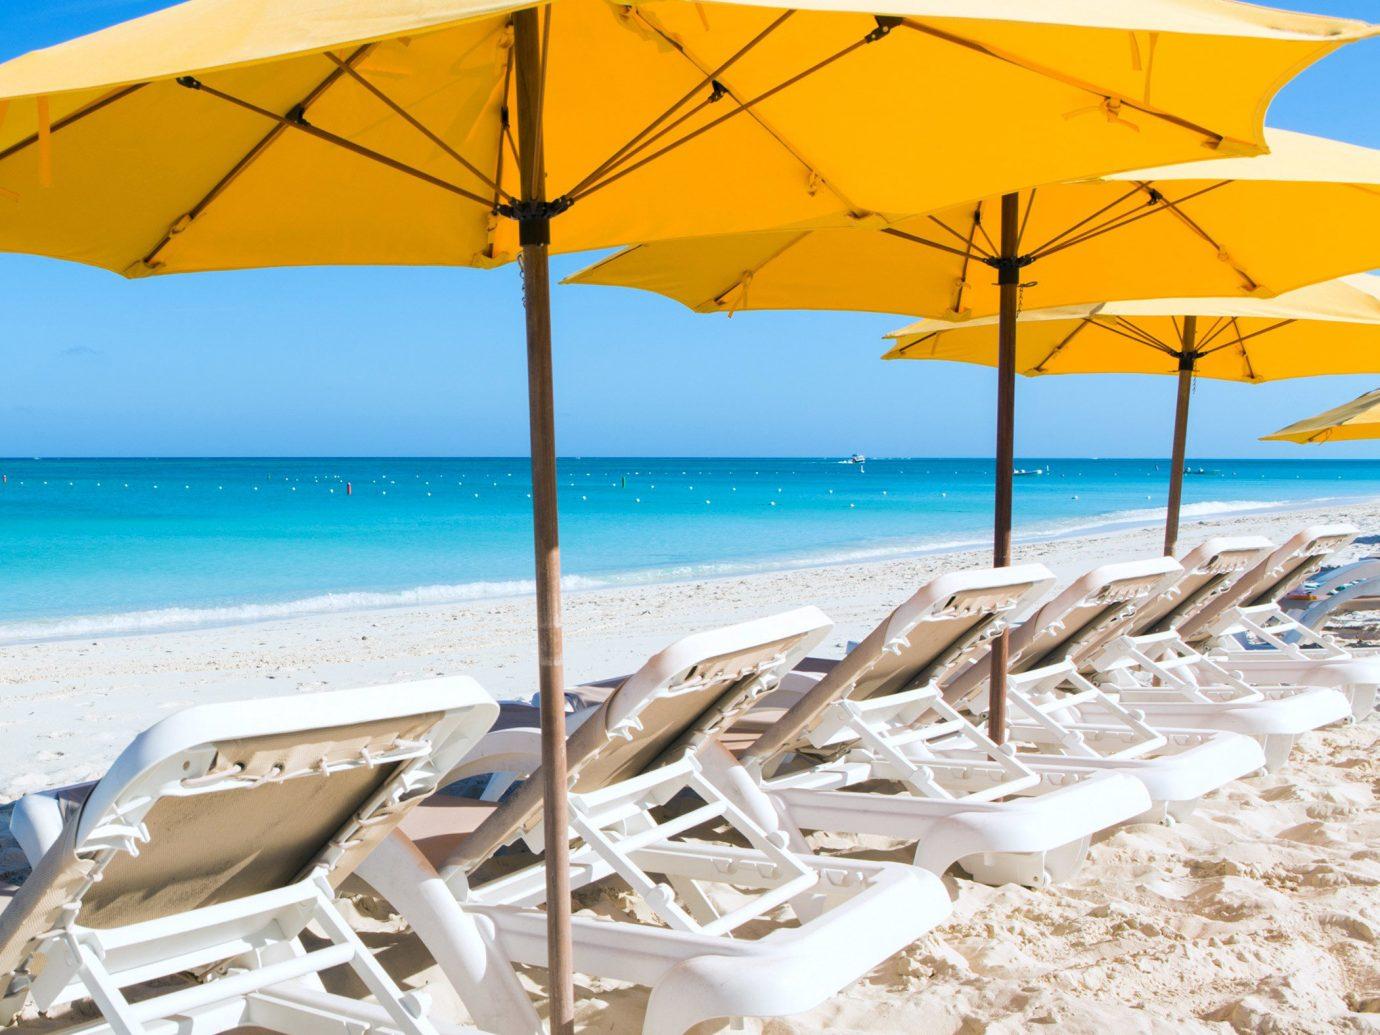 Beach Beachfront Grounds Hotels Play Resort Scenic views accessory sky umbrella outdoor chair shore Ocean Nature Sea caribbean Coast vacation